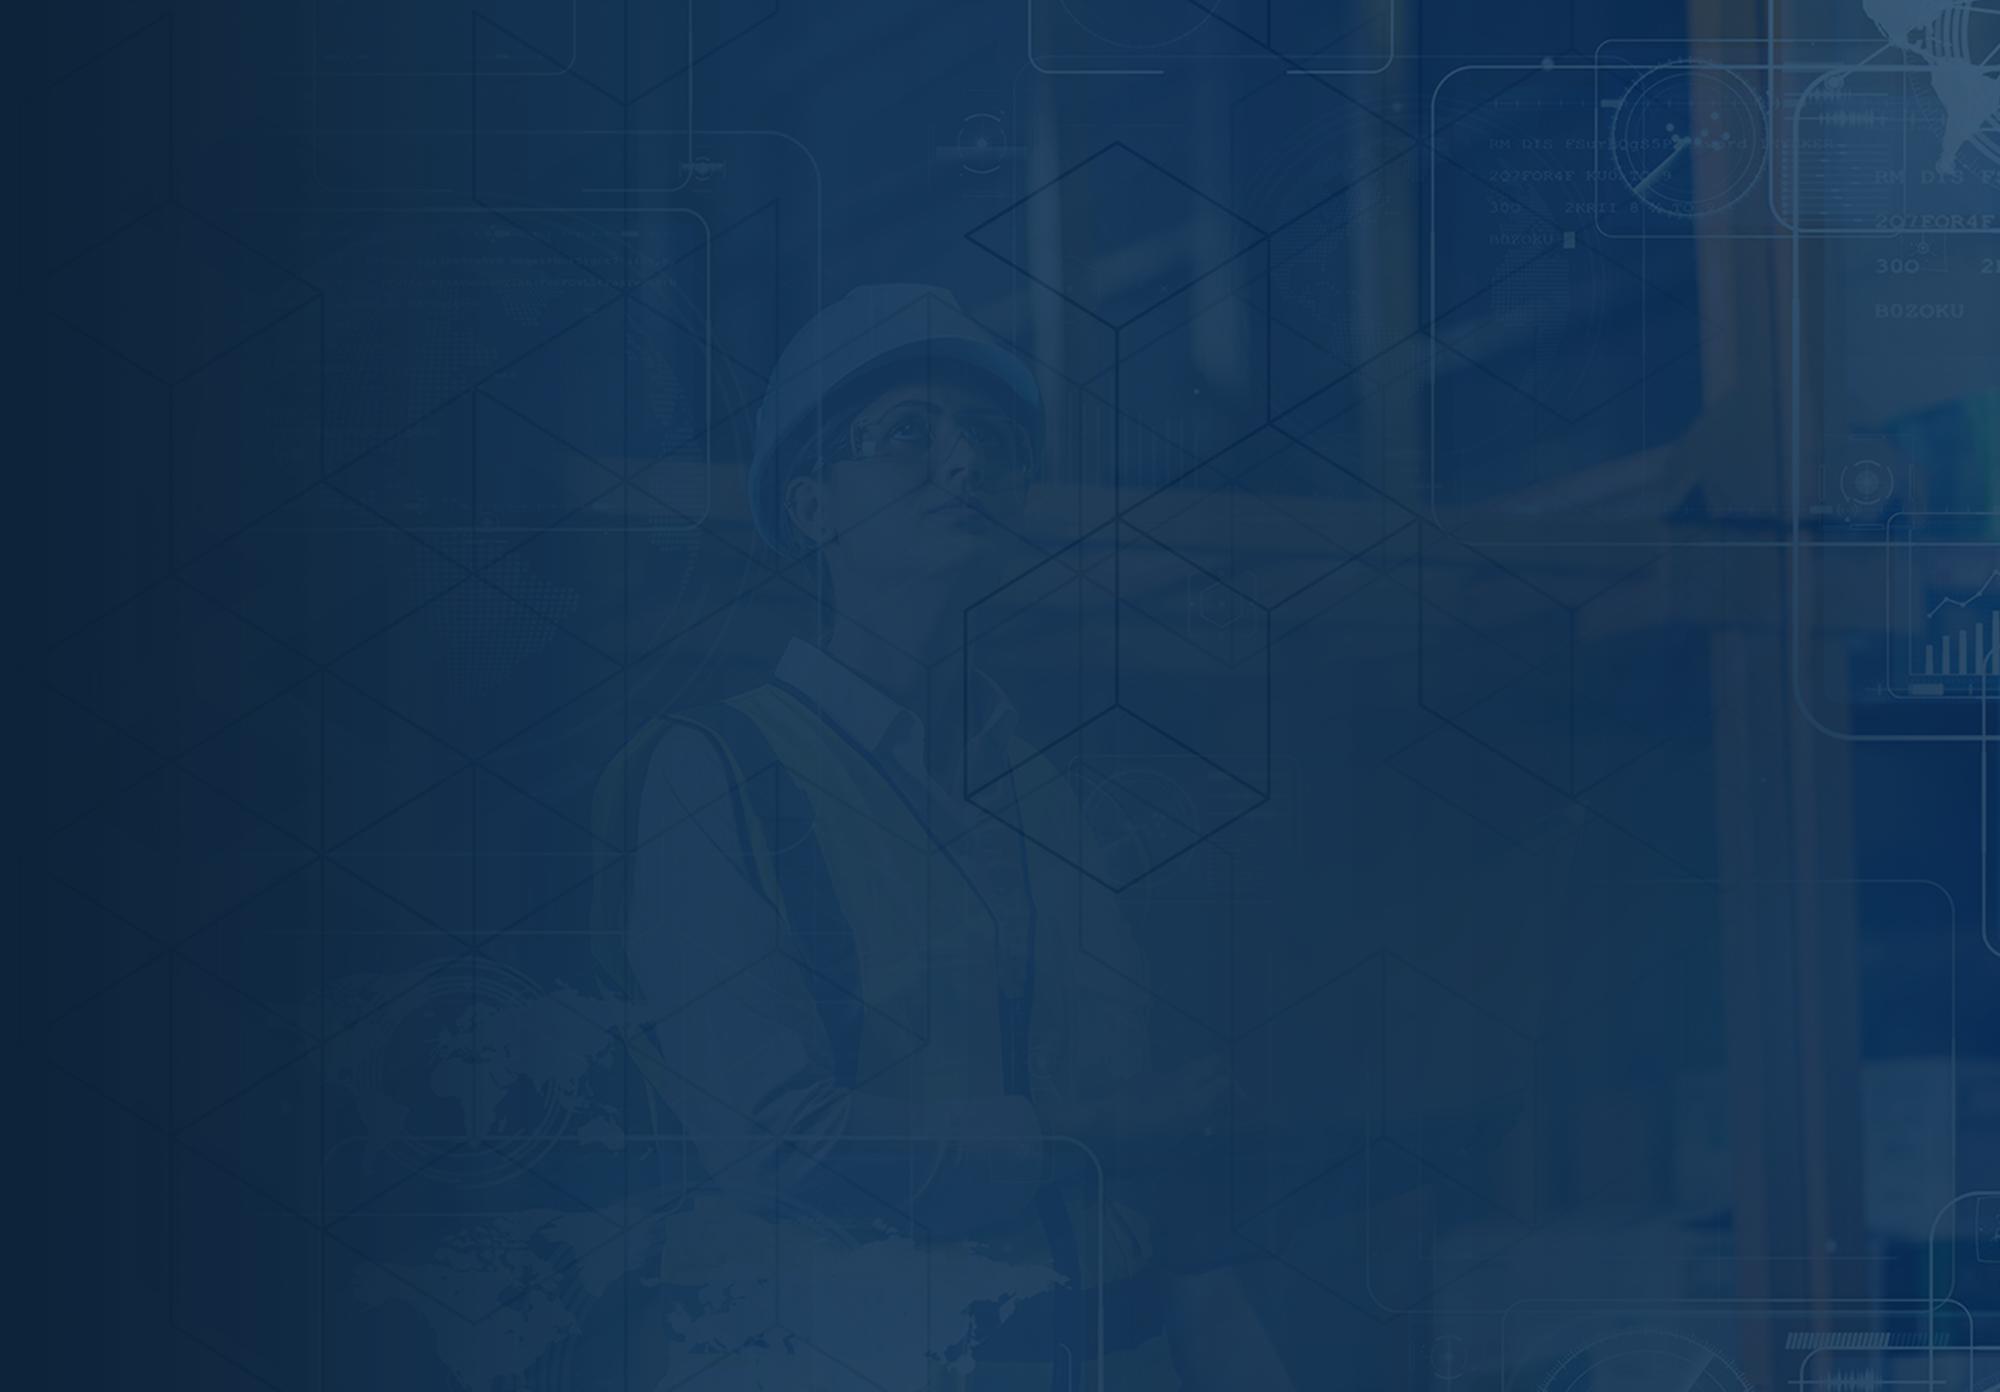 MOSAic for Industrial BG -005